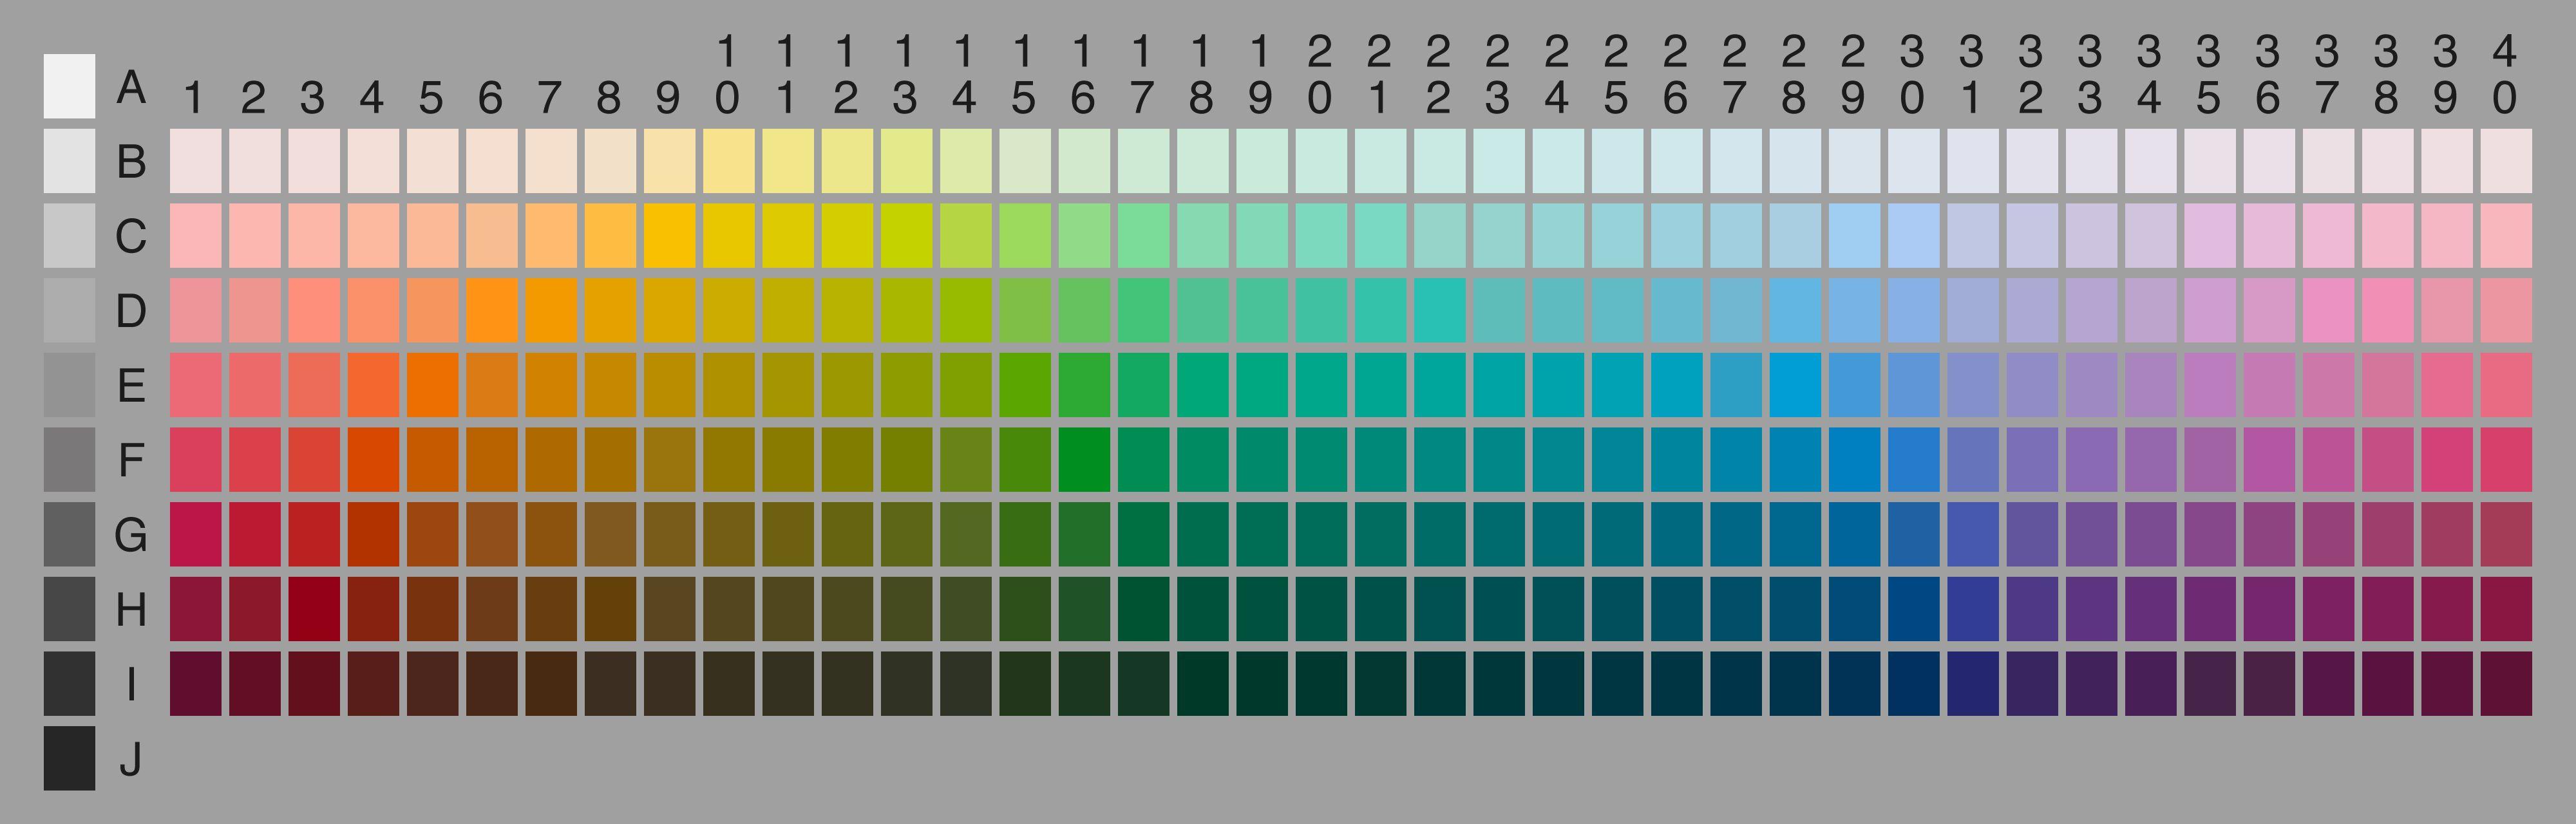 Image from https://www1.icsi.berkeley.edu/wcs/images/jrus-20100531/wcs-chart-4x.png.